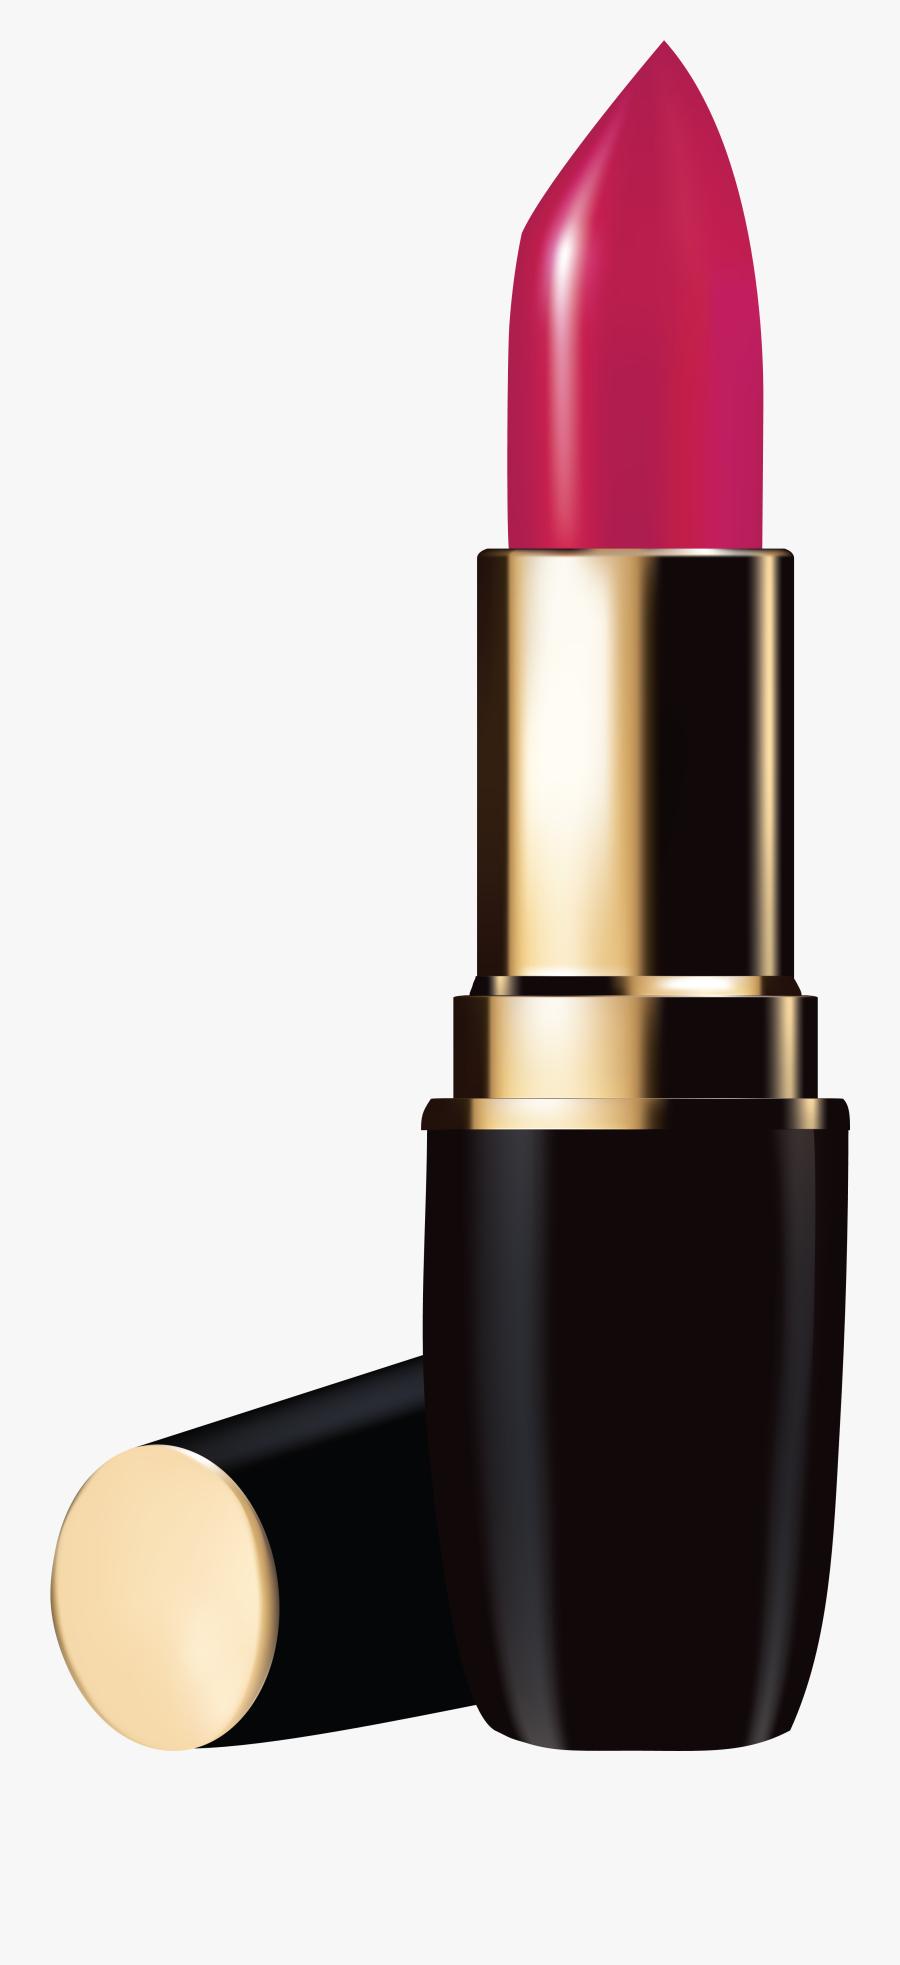 Lipstick Cosmetics Clip Art - Transparent Background Lipstick Png, Transparent Clipart